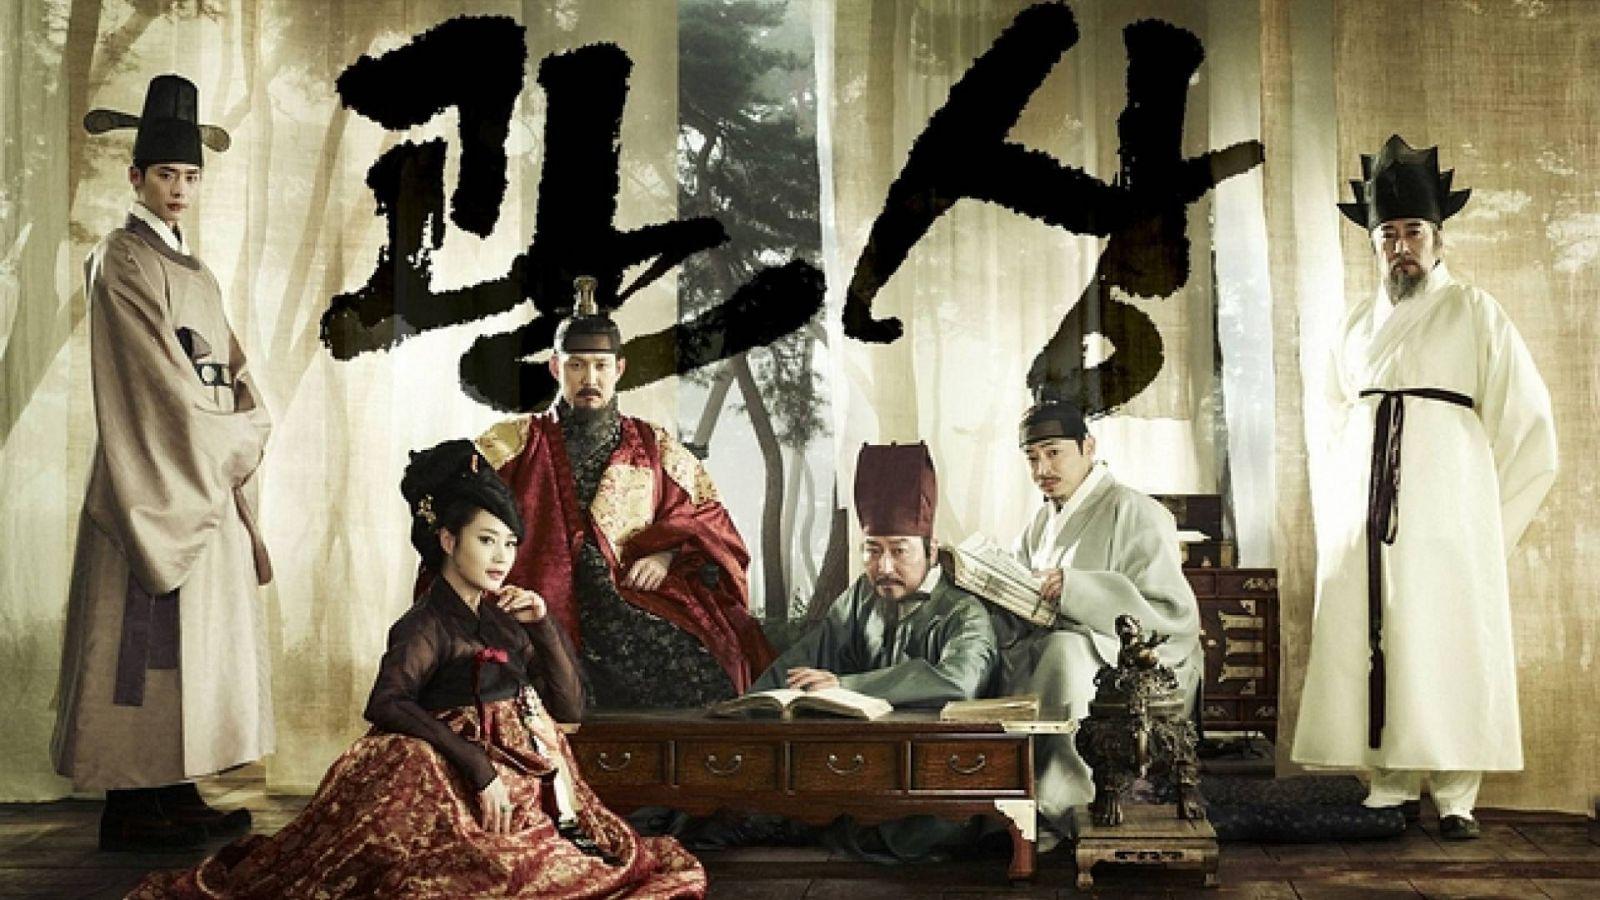 2015 Korean Movie Festival esittää elokuvia Helsingissä © The Face Reader. All Rights Reserved.